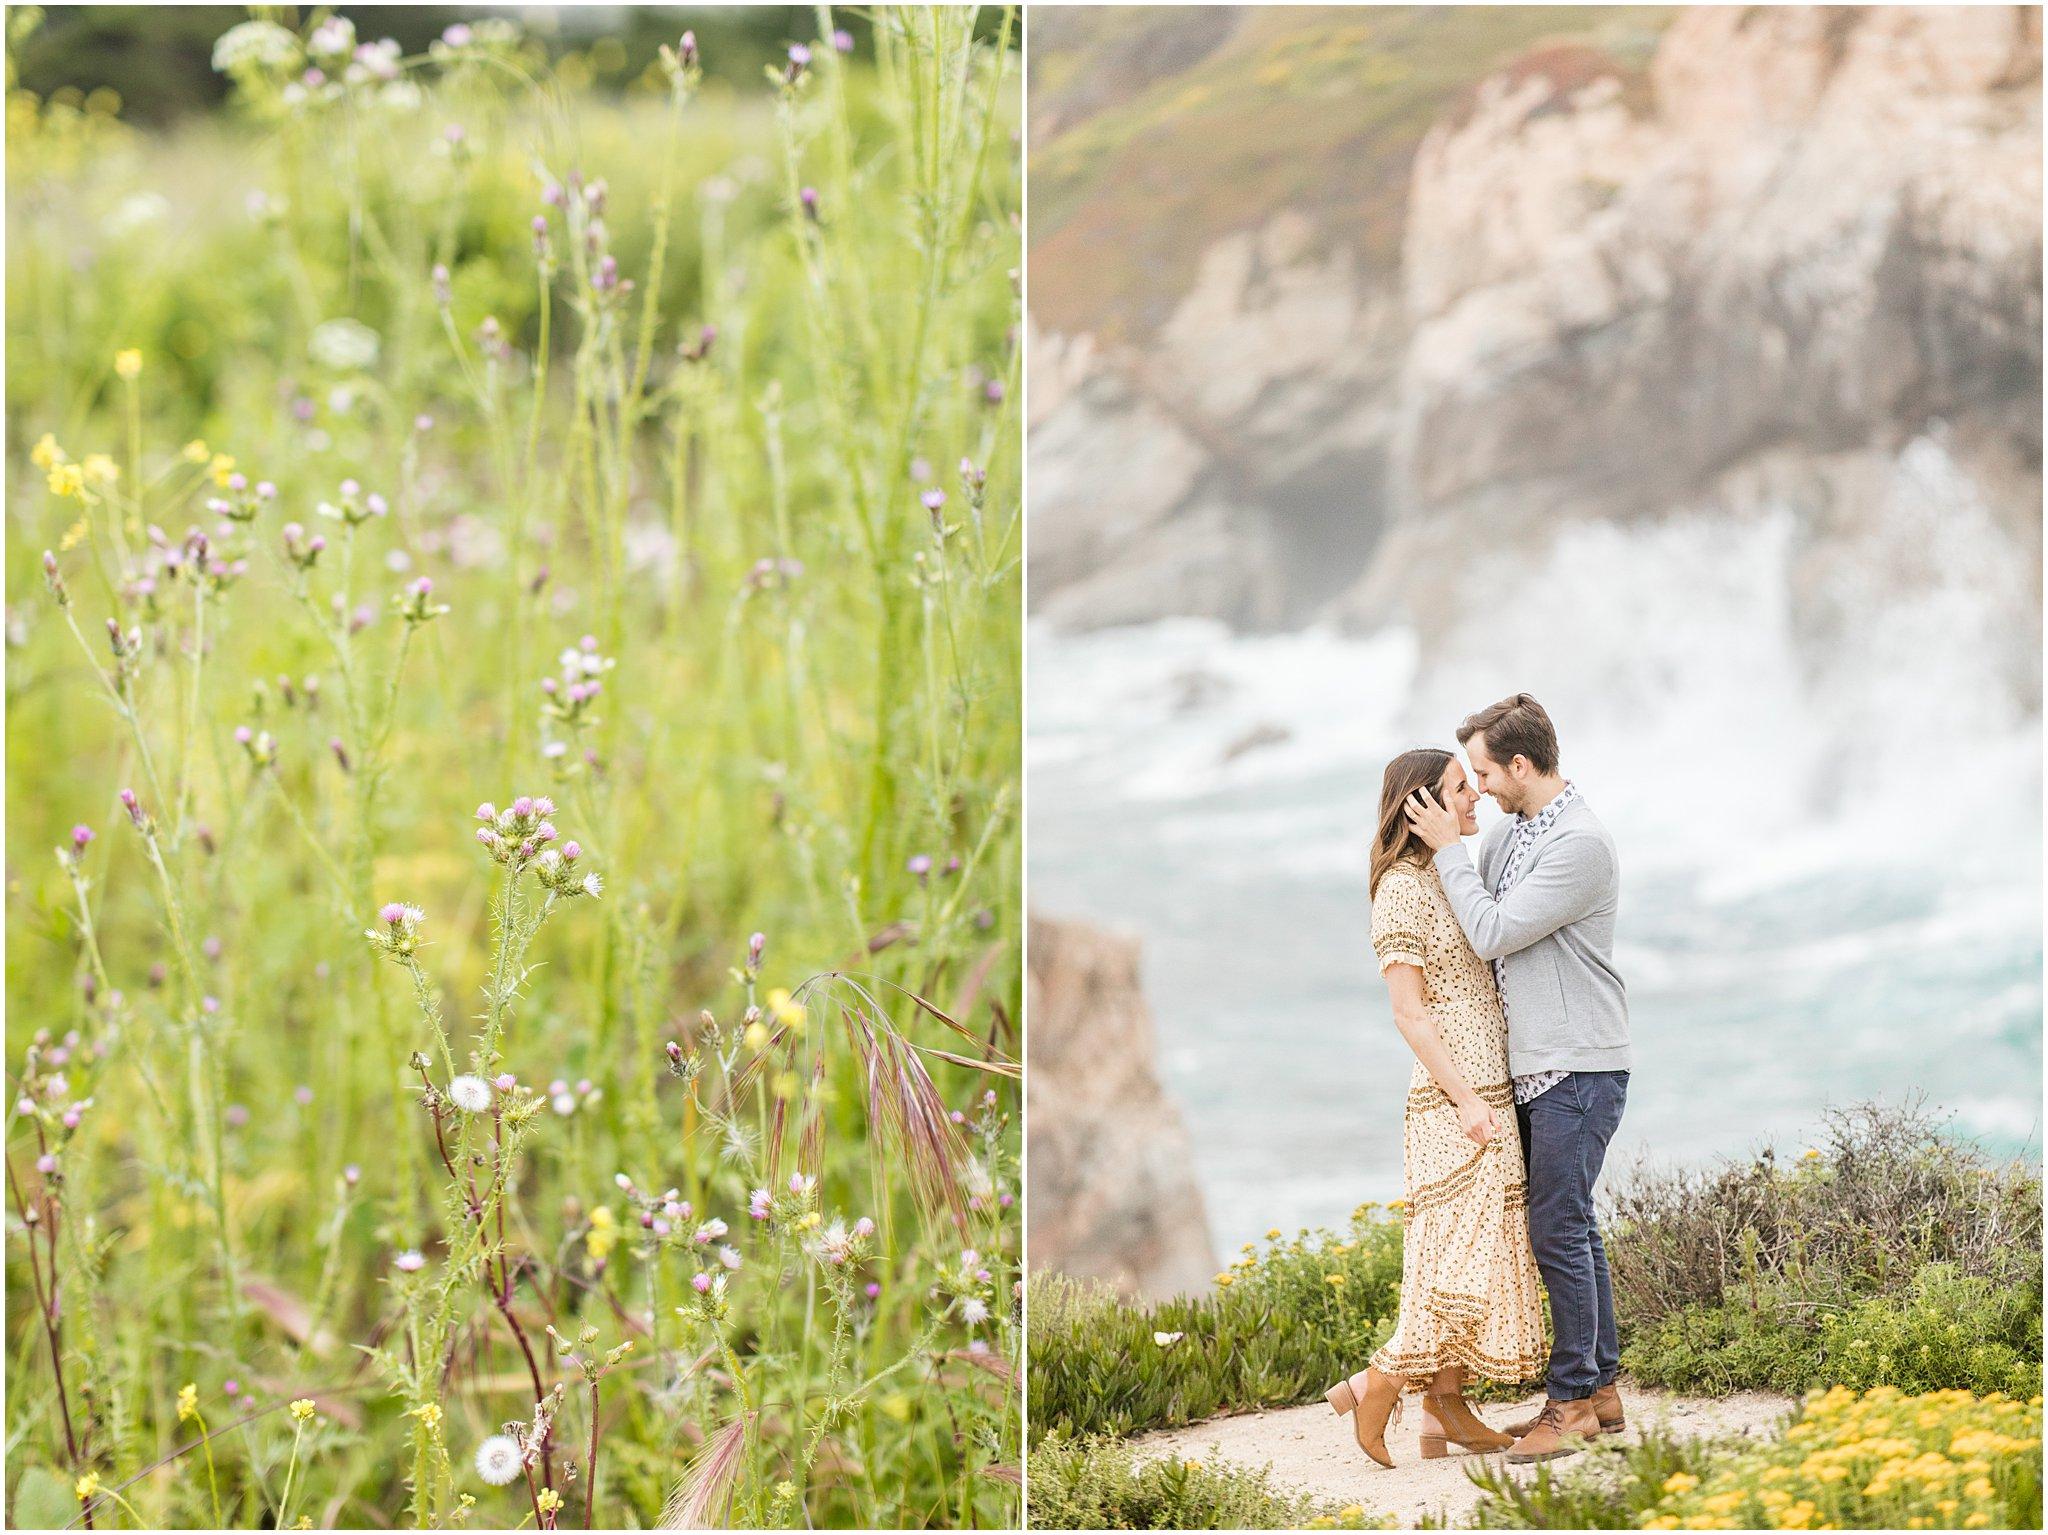 2019 carmel highlands garrapata state park couples portrait session bay area wedding photographer_0020.jpg